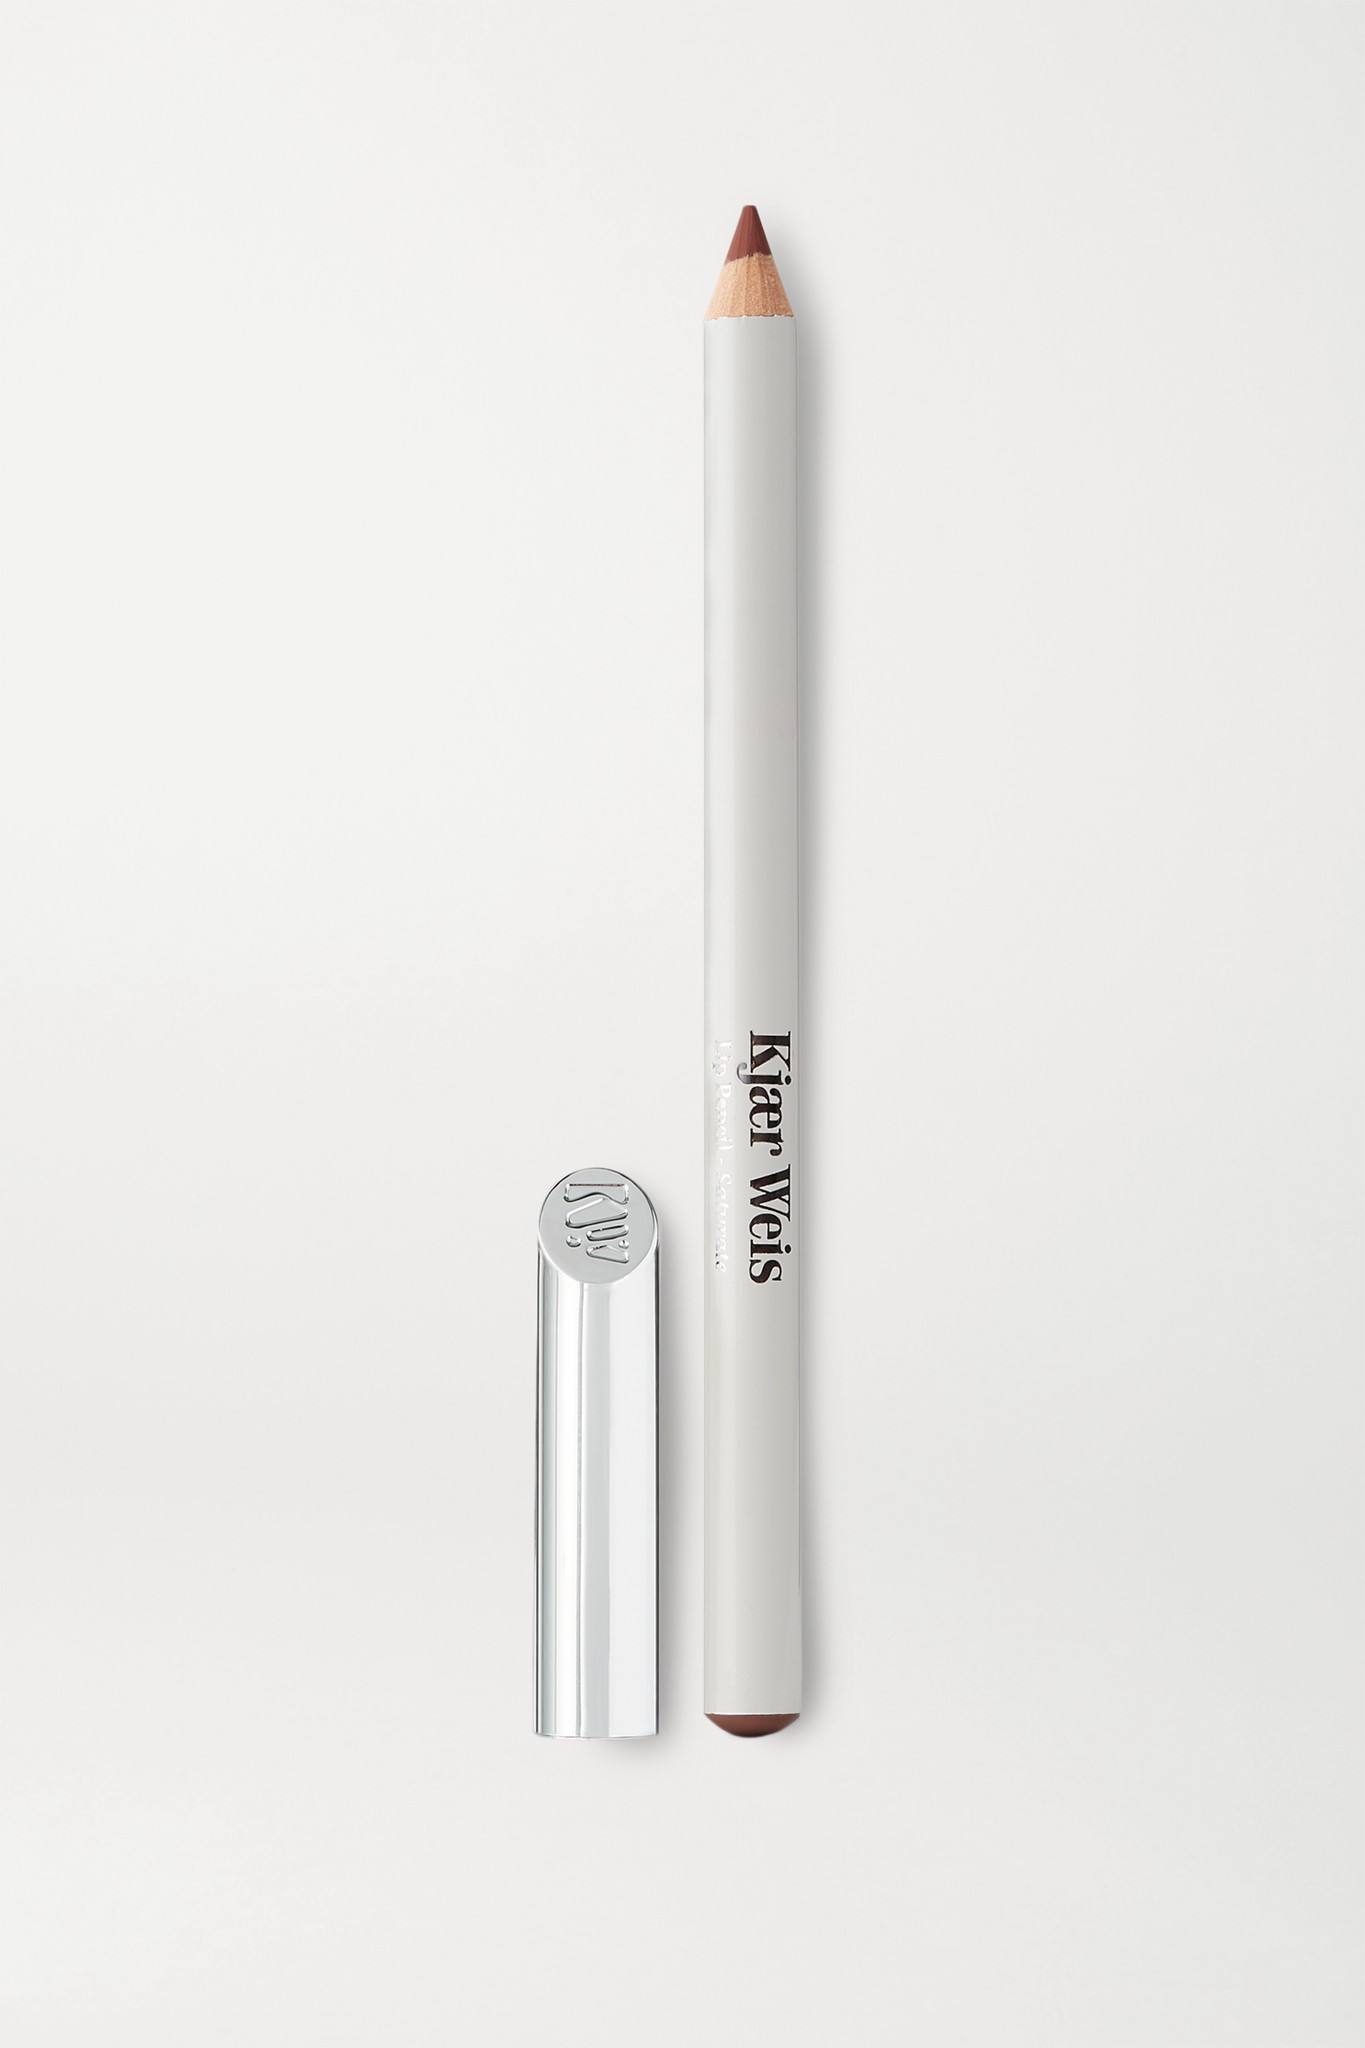 KJAER WEIS - Lip Pencil - Rich - Neutrals - one size